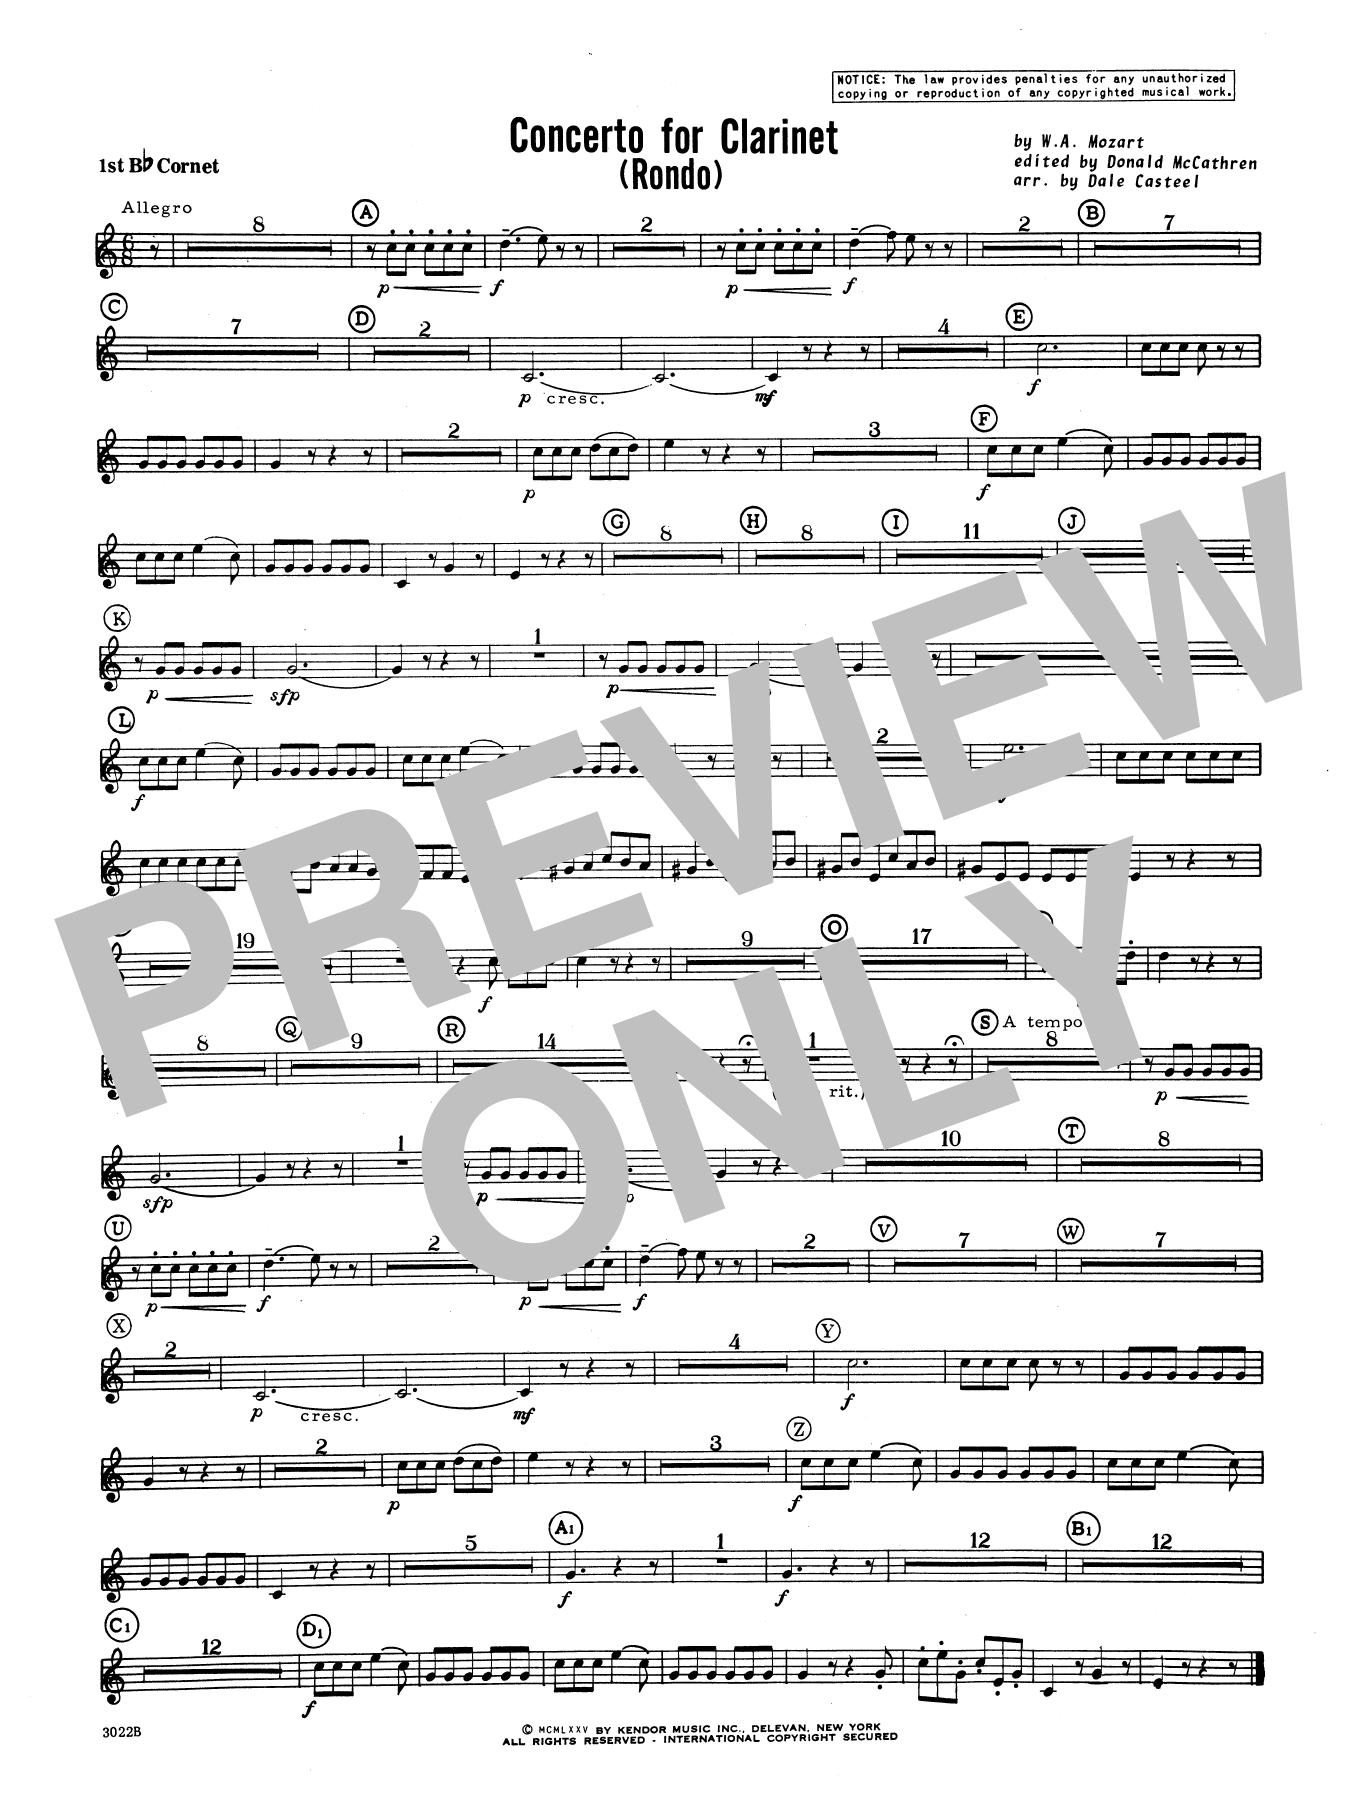 Donald McCathren and Dale Casteel Concerto For Clarinet - Rondo (3rd Movement) - K.622 - Cornet 1 sheet music notes printable PDF score